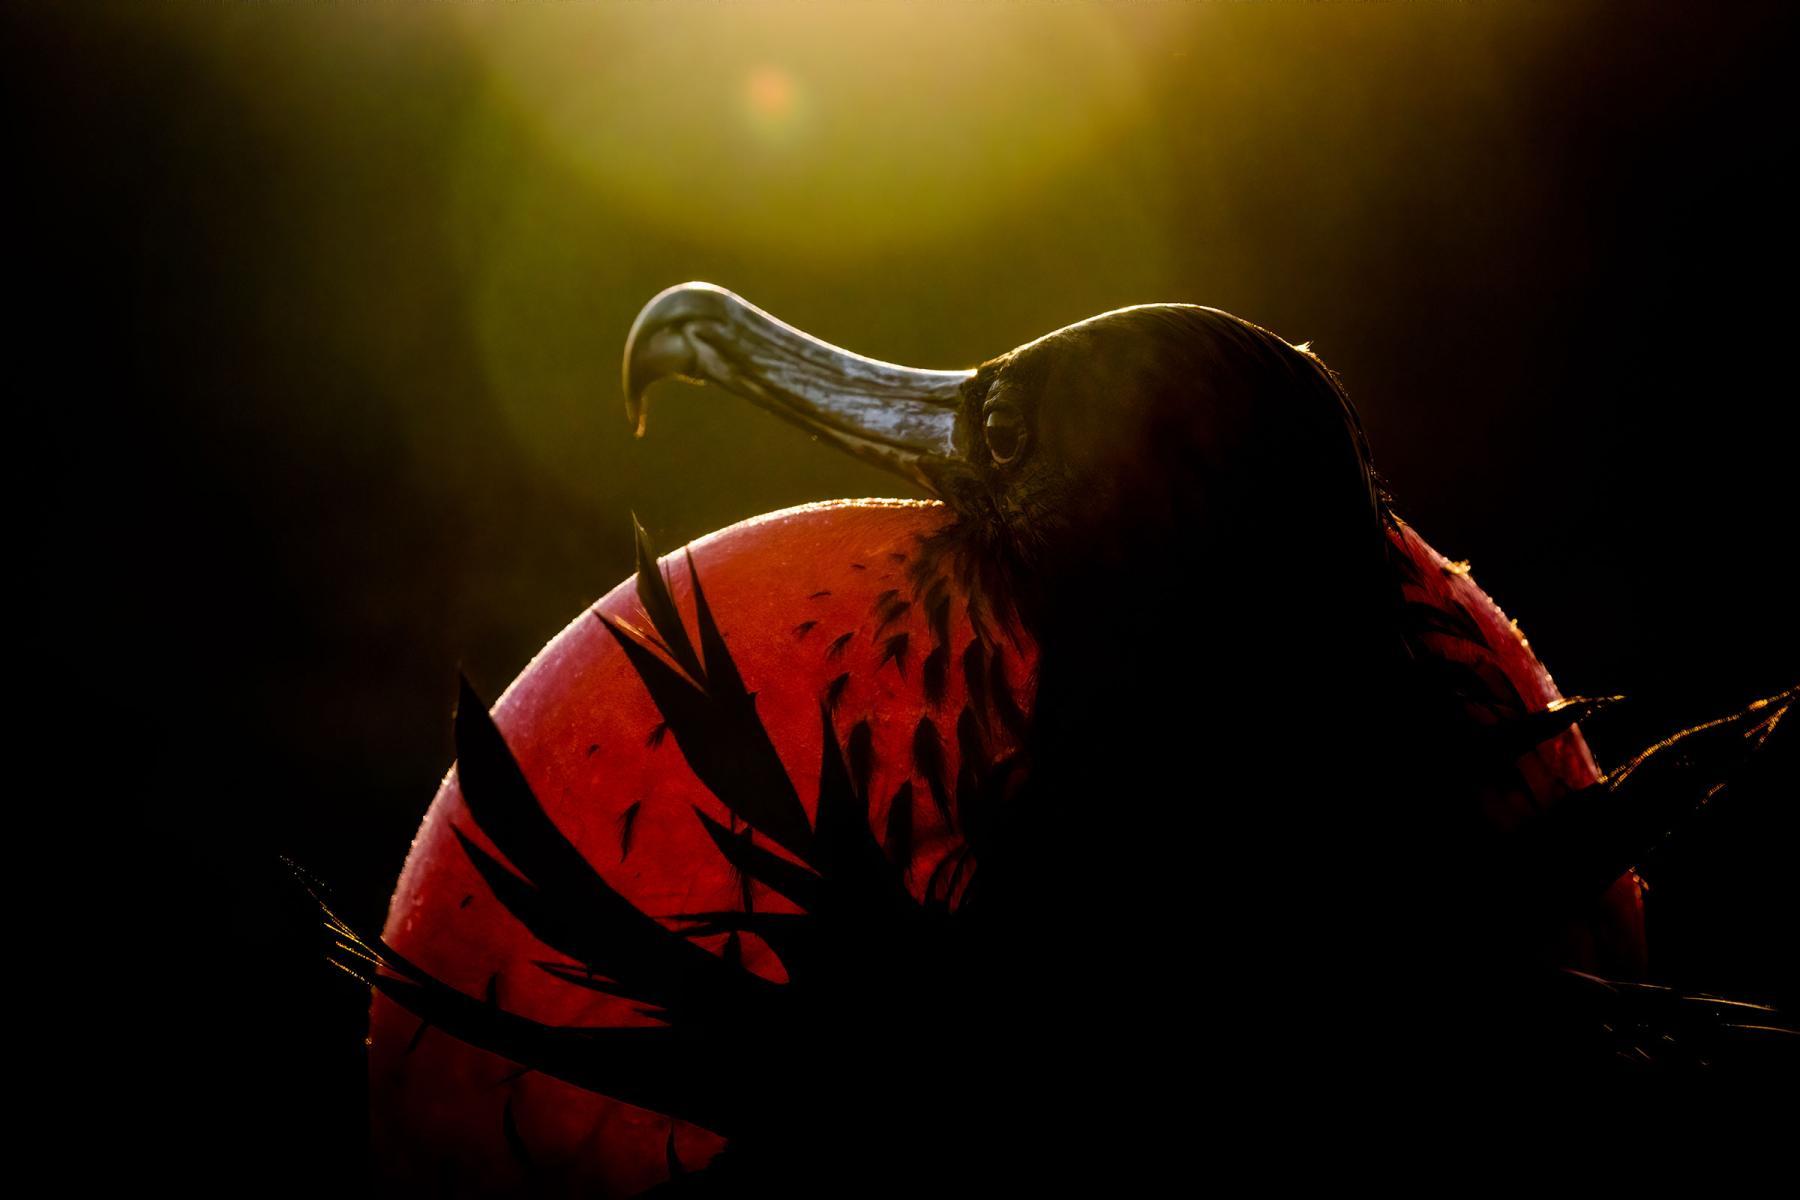 Professional Winner: Magnificent Frigatebird